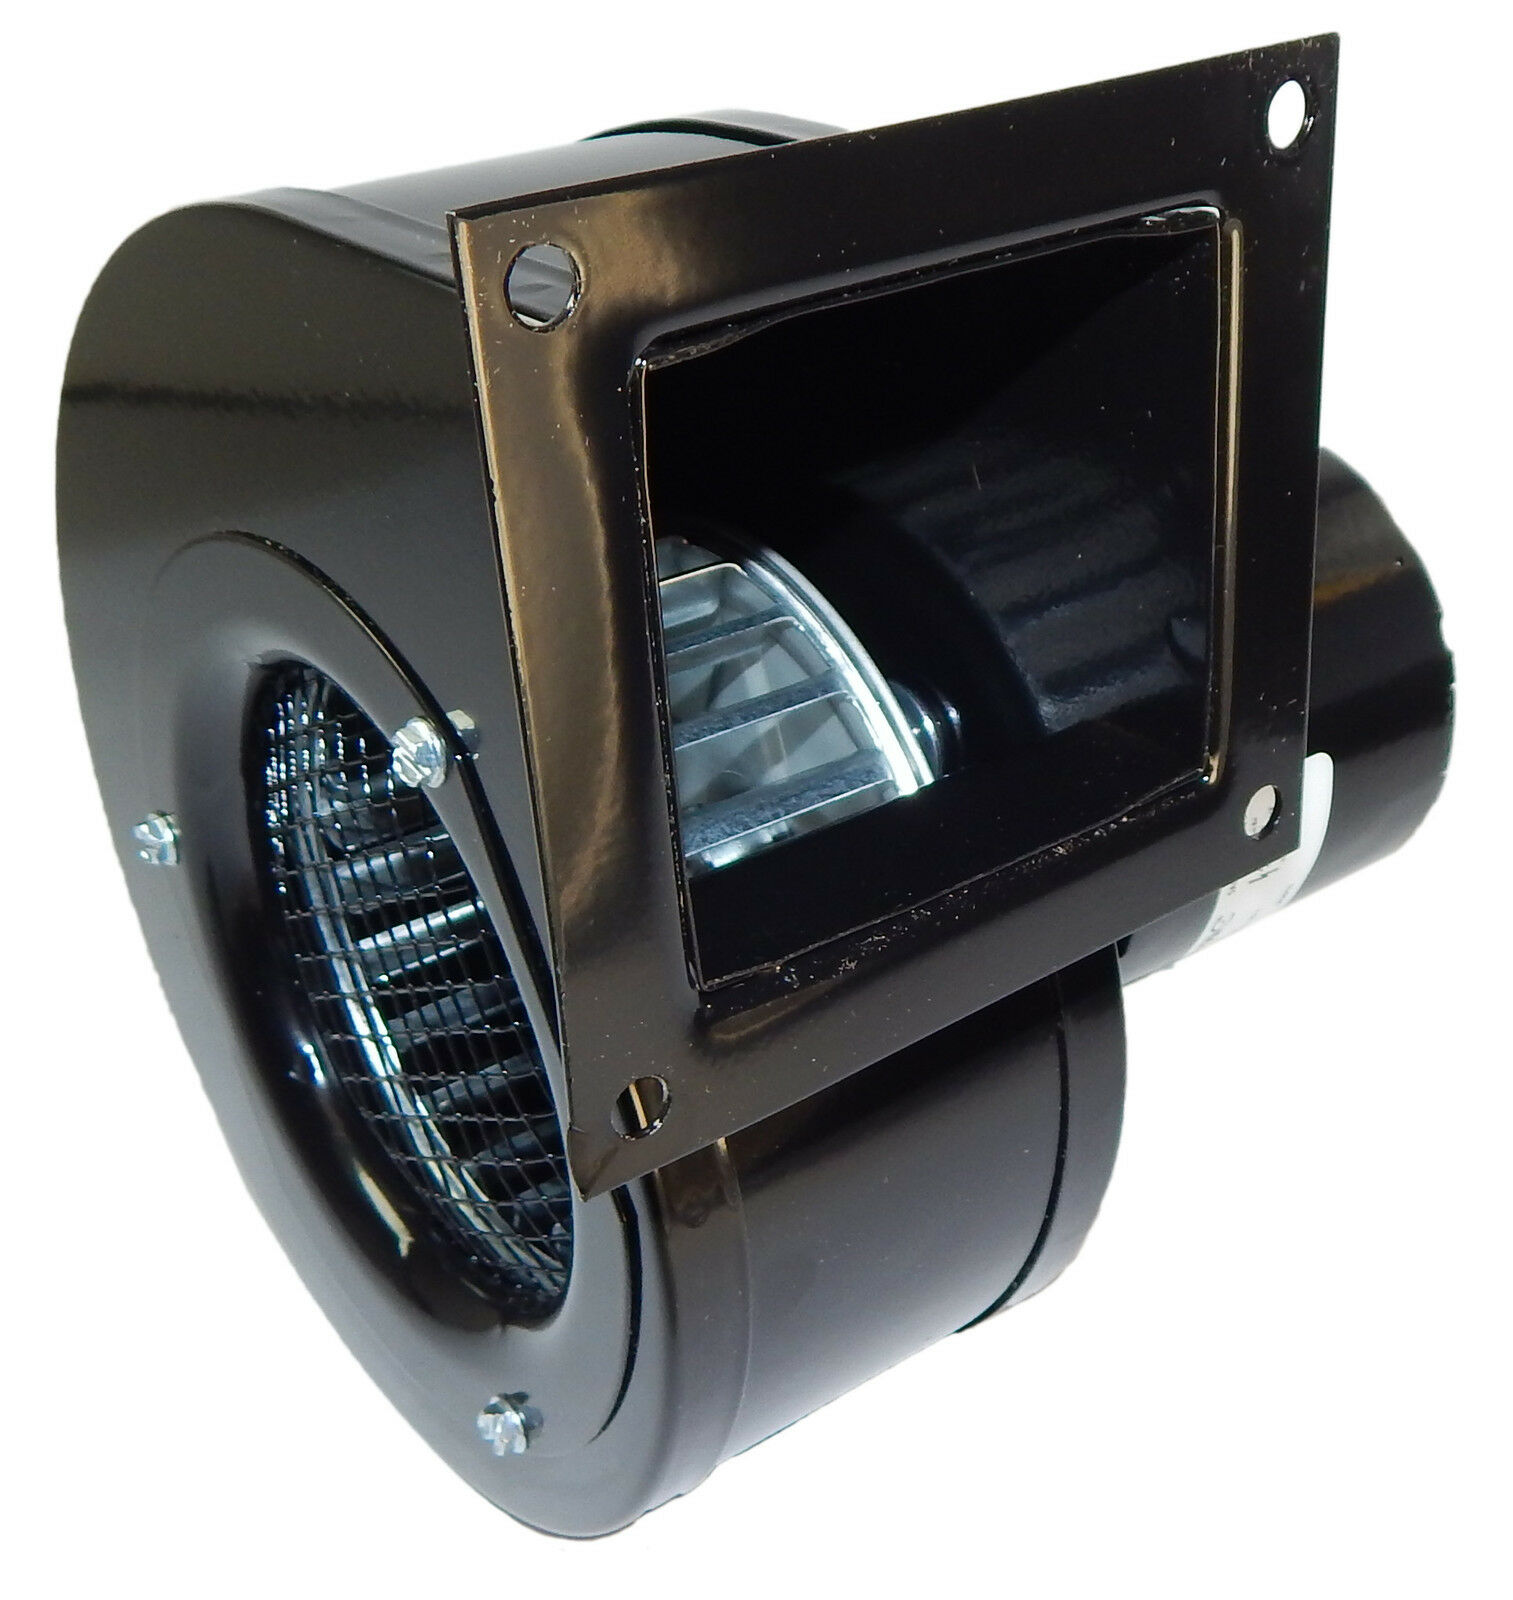 Fasco B24220 115 Volt 135 Cfm Centrifugal Blower Ebay B45227 Wiring Diagram 3200 Rpm Volts